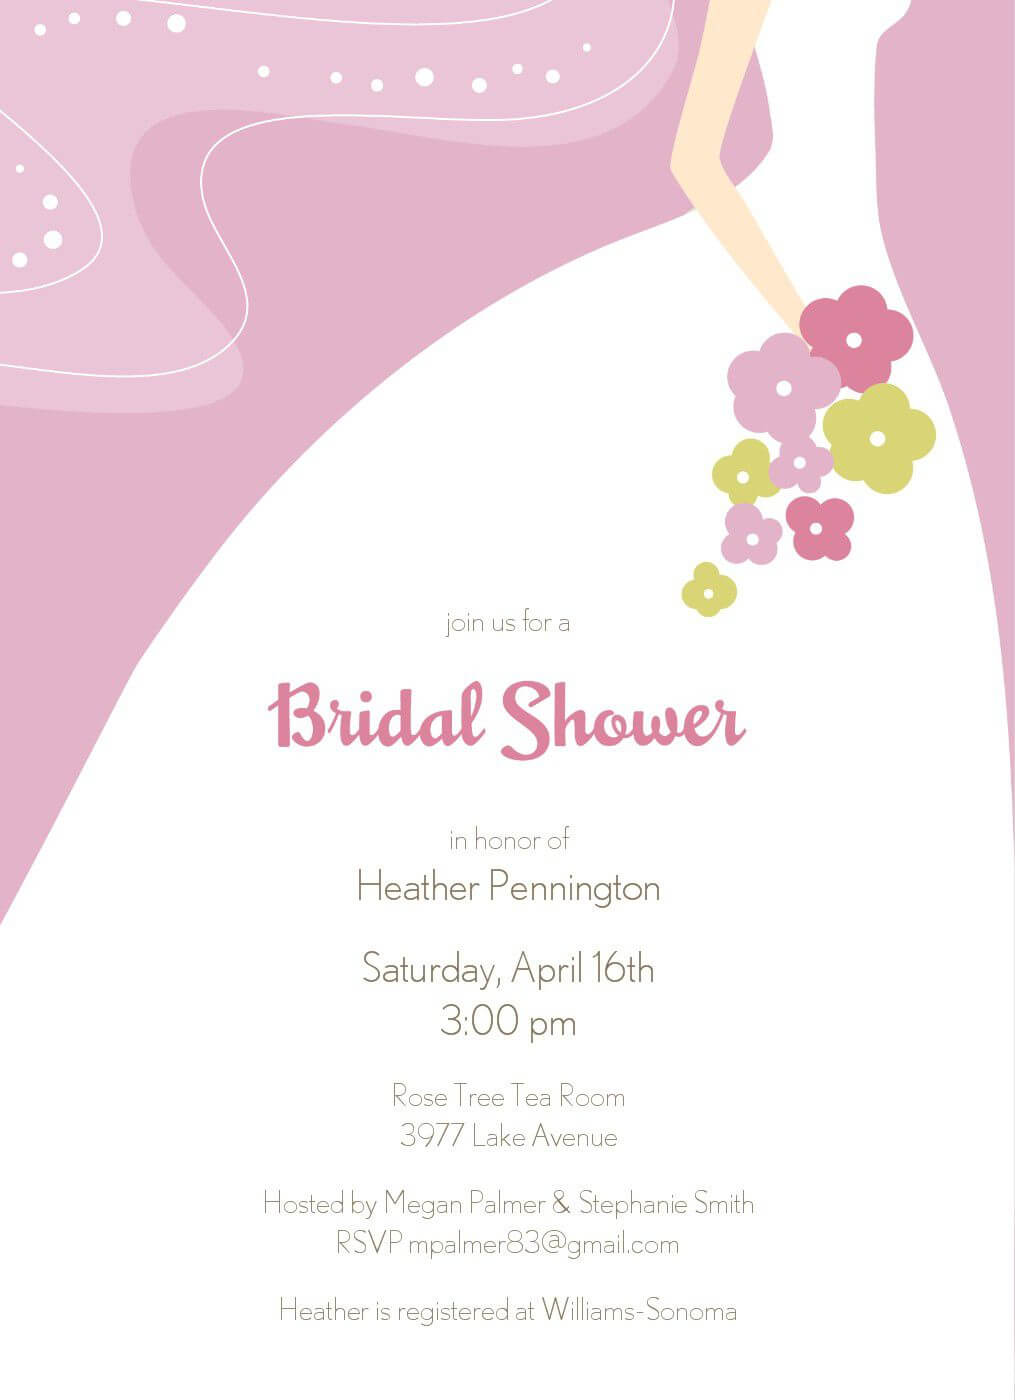 Bridal Shower Invitation Templates : Bridal Shower Inside Blank Bridal Shower Invitations Templates